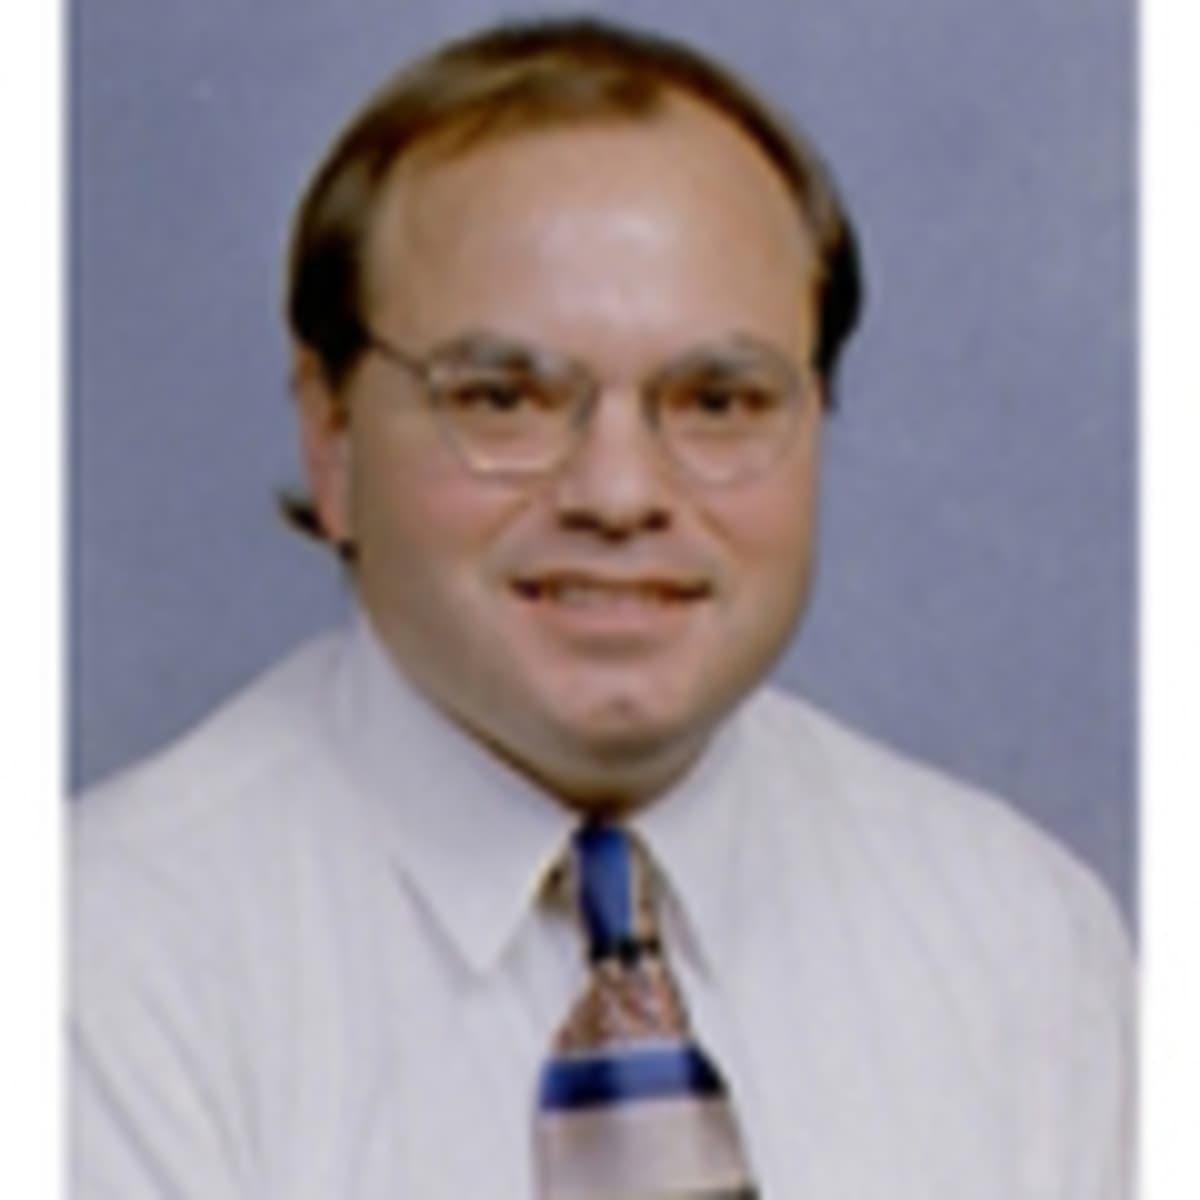 dr jay lieberman video dr jay hagloch md lantic fl family doctor ...